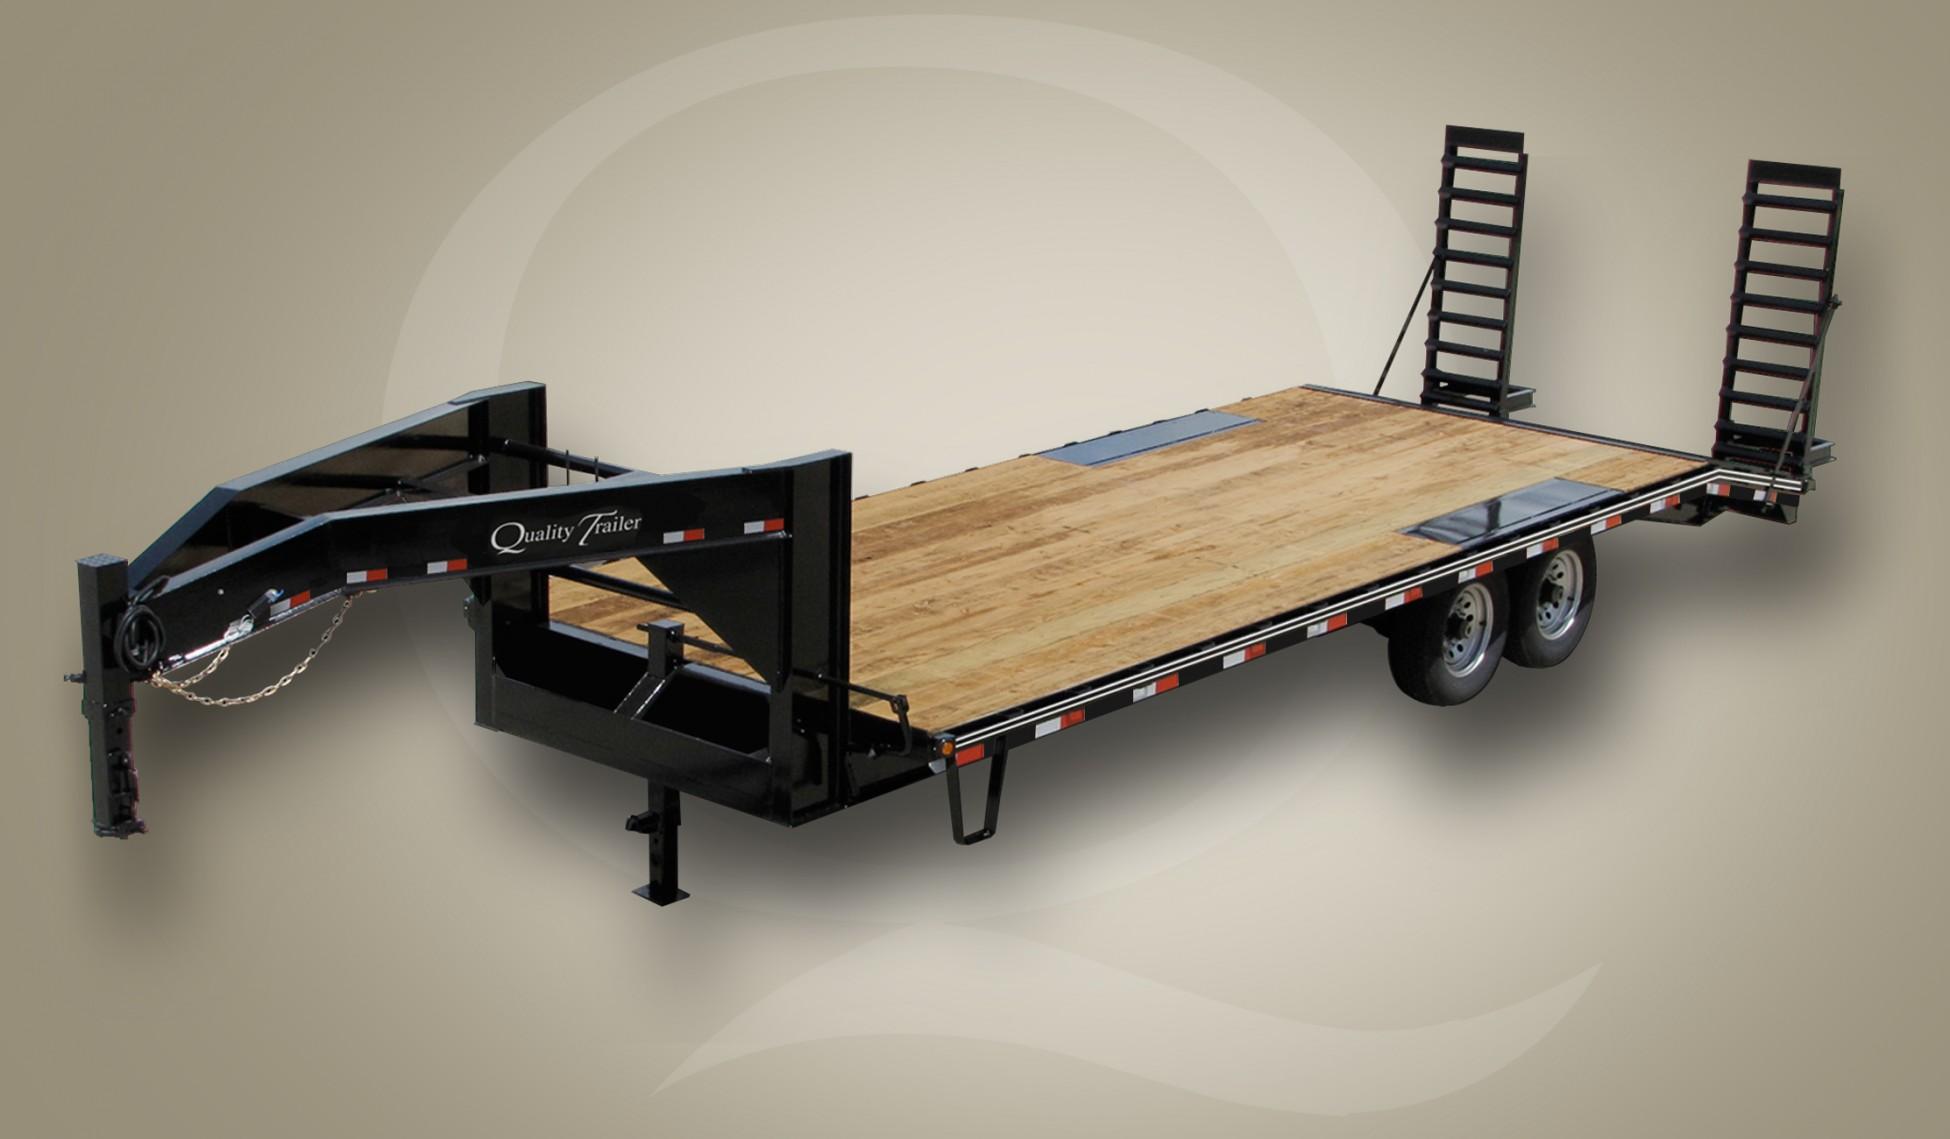 quality trailer wiring diagram car trailers  equipment trailers  landscape trailers  car trailers  equipment trailers